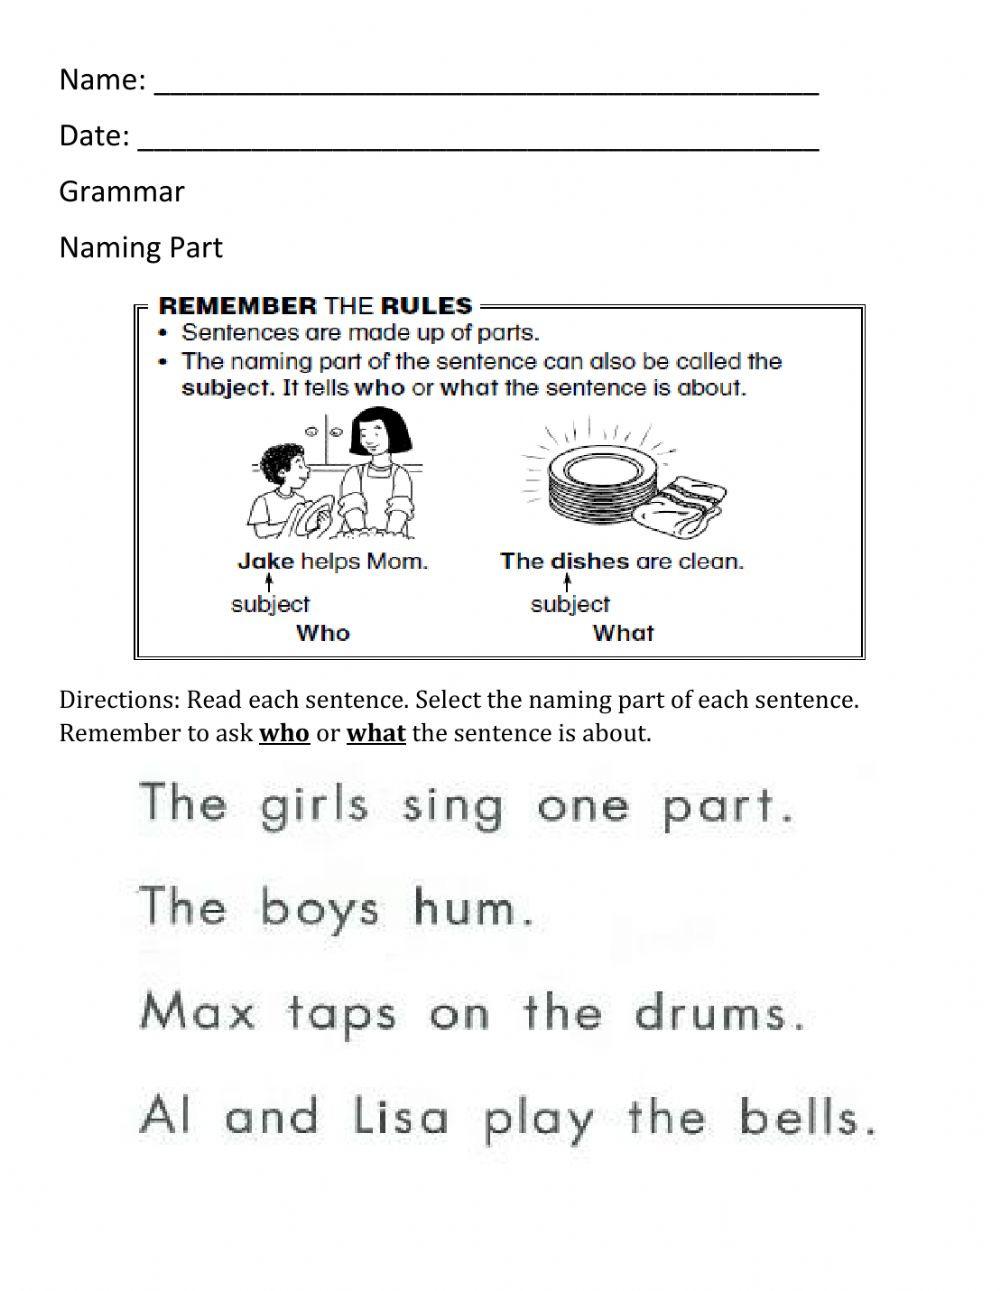 Parts Of A Sentence Worksheet Naming Part Worksheet 1 Interactive Worksheet